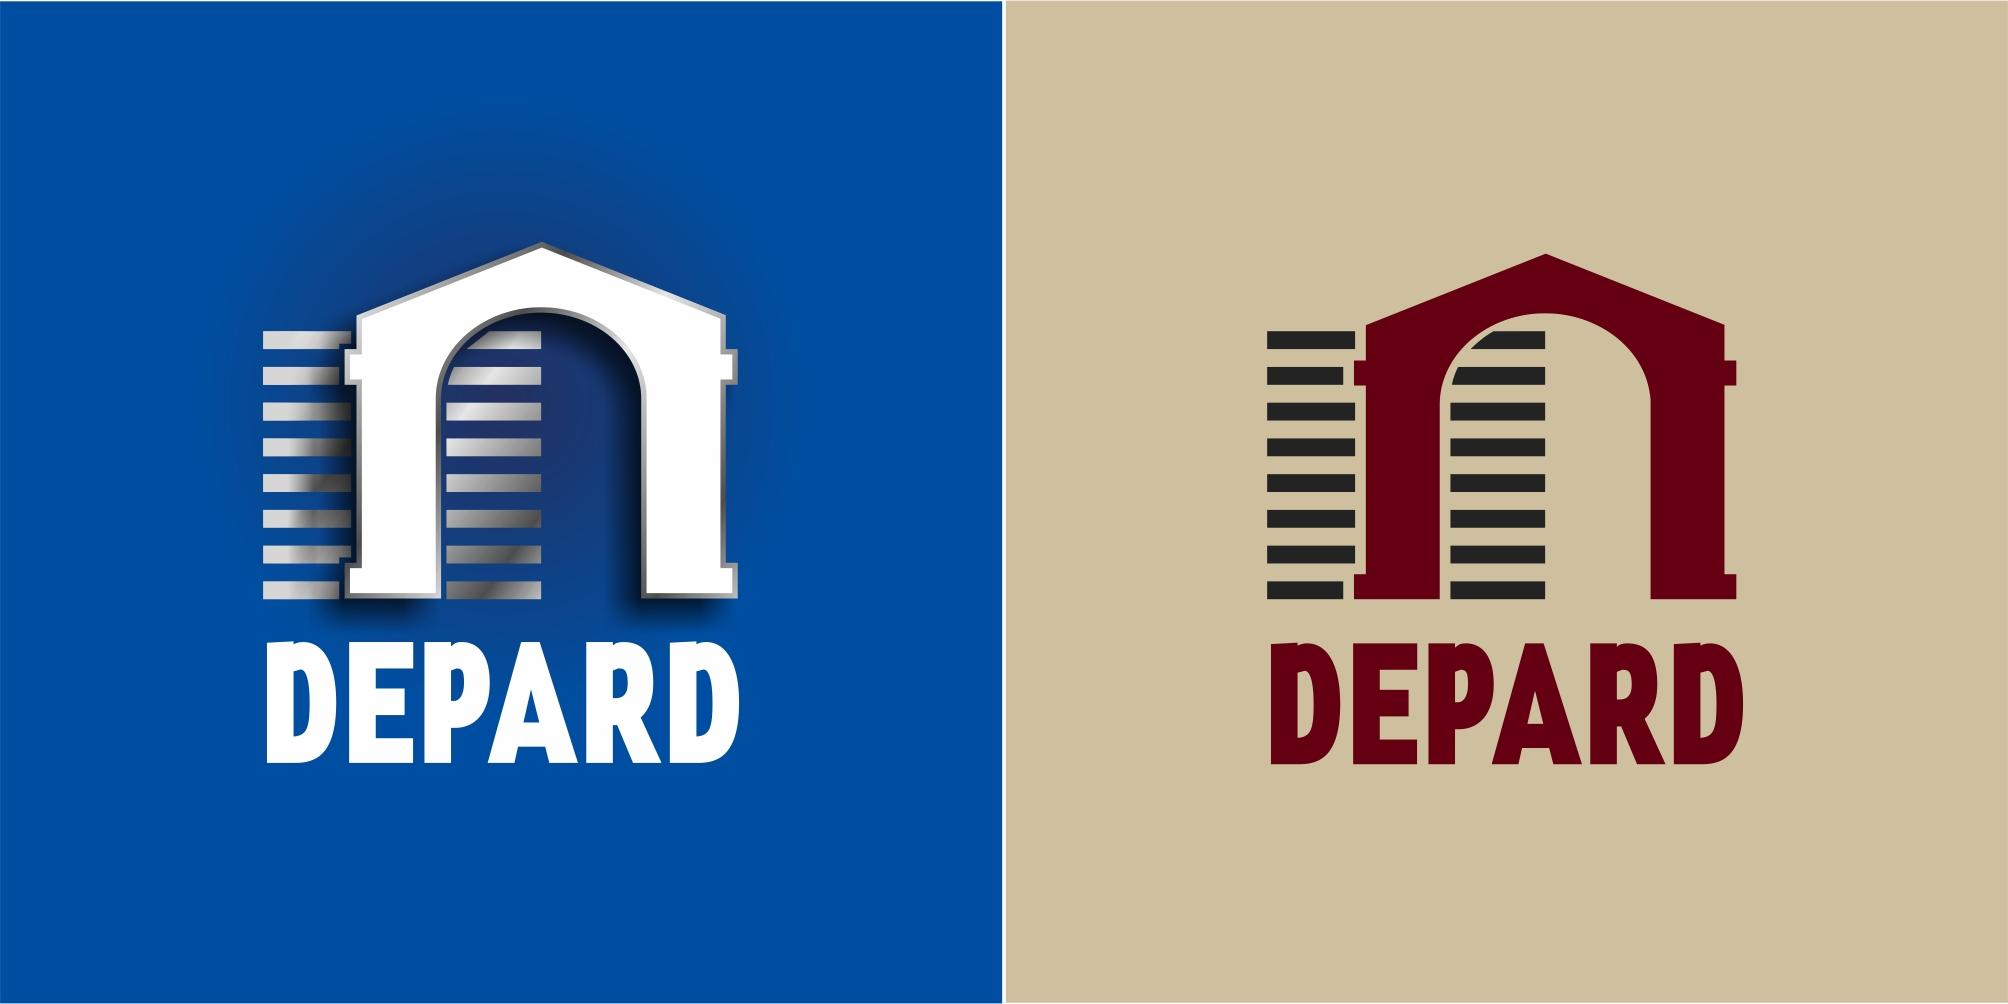 Логотип для компании (услуги недвижимость) фото f_67859354da1d5534.jpg